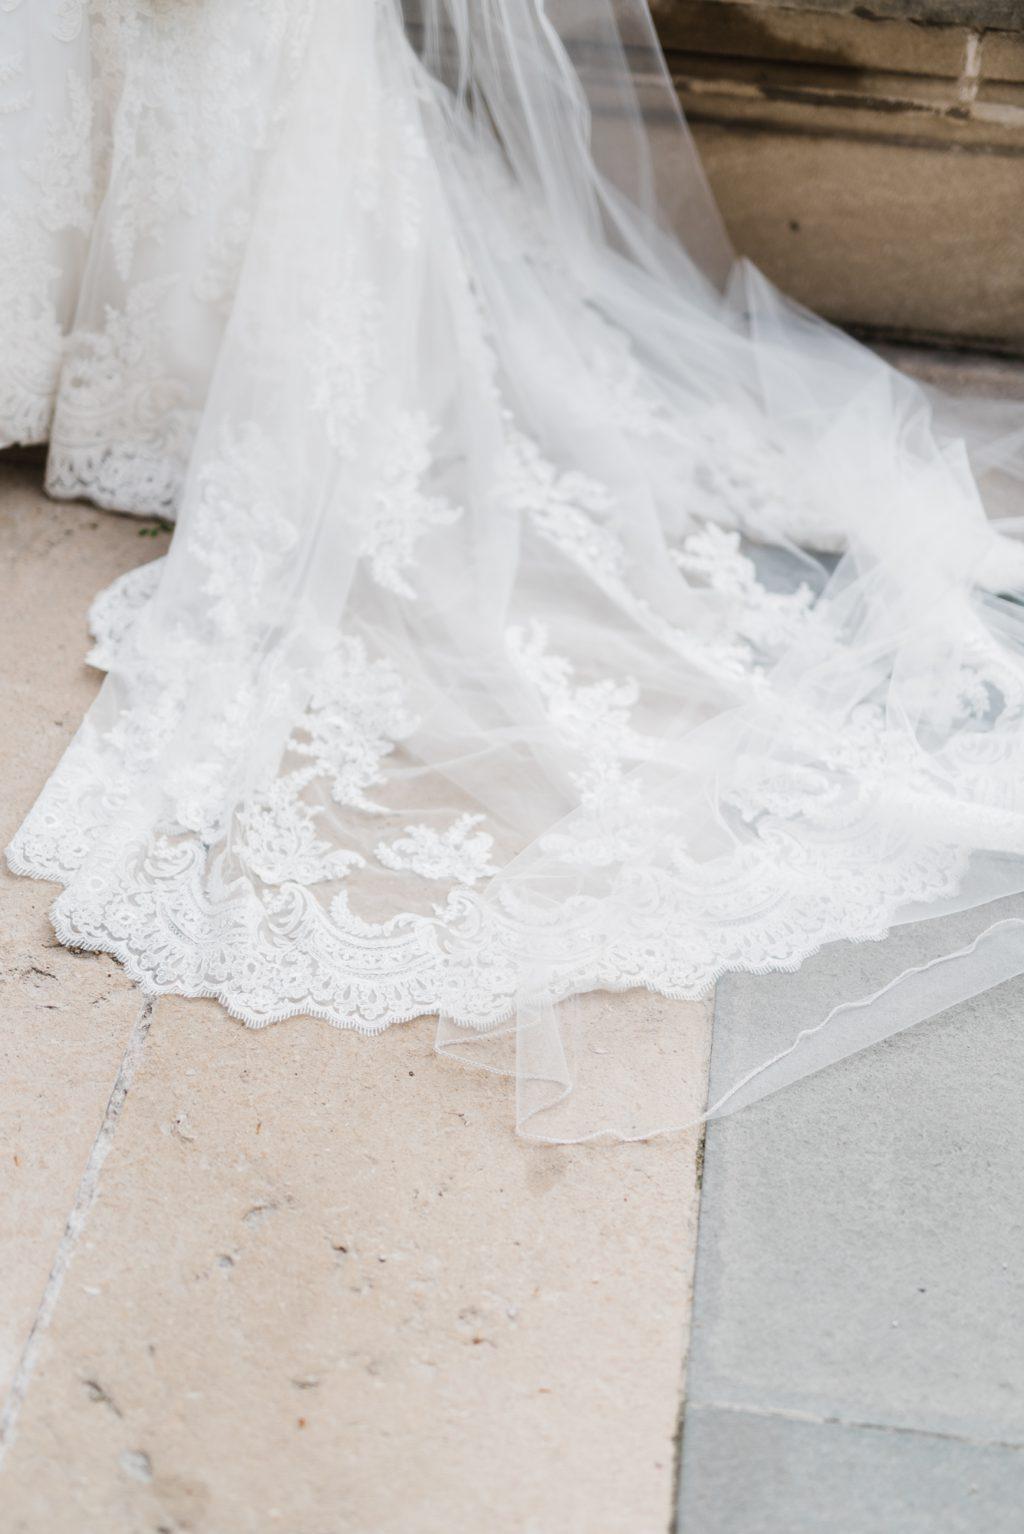 haleyrichterphoto-front-and-palmer-spring-wedding-rodin-museum-loews-hotel-philadelphia-092